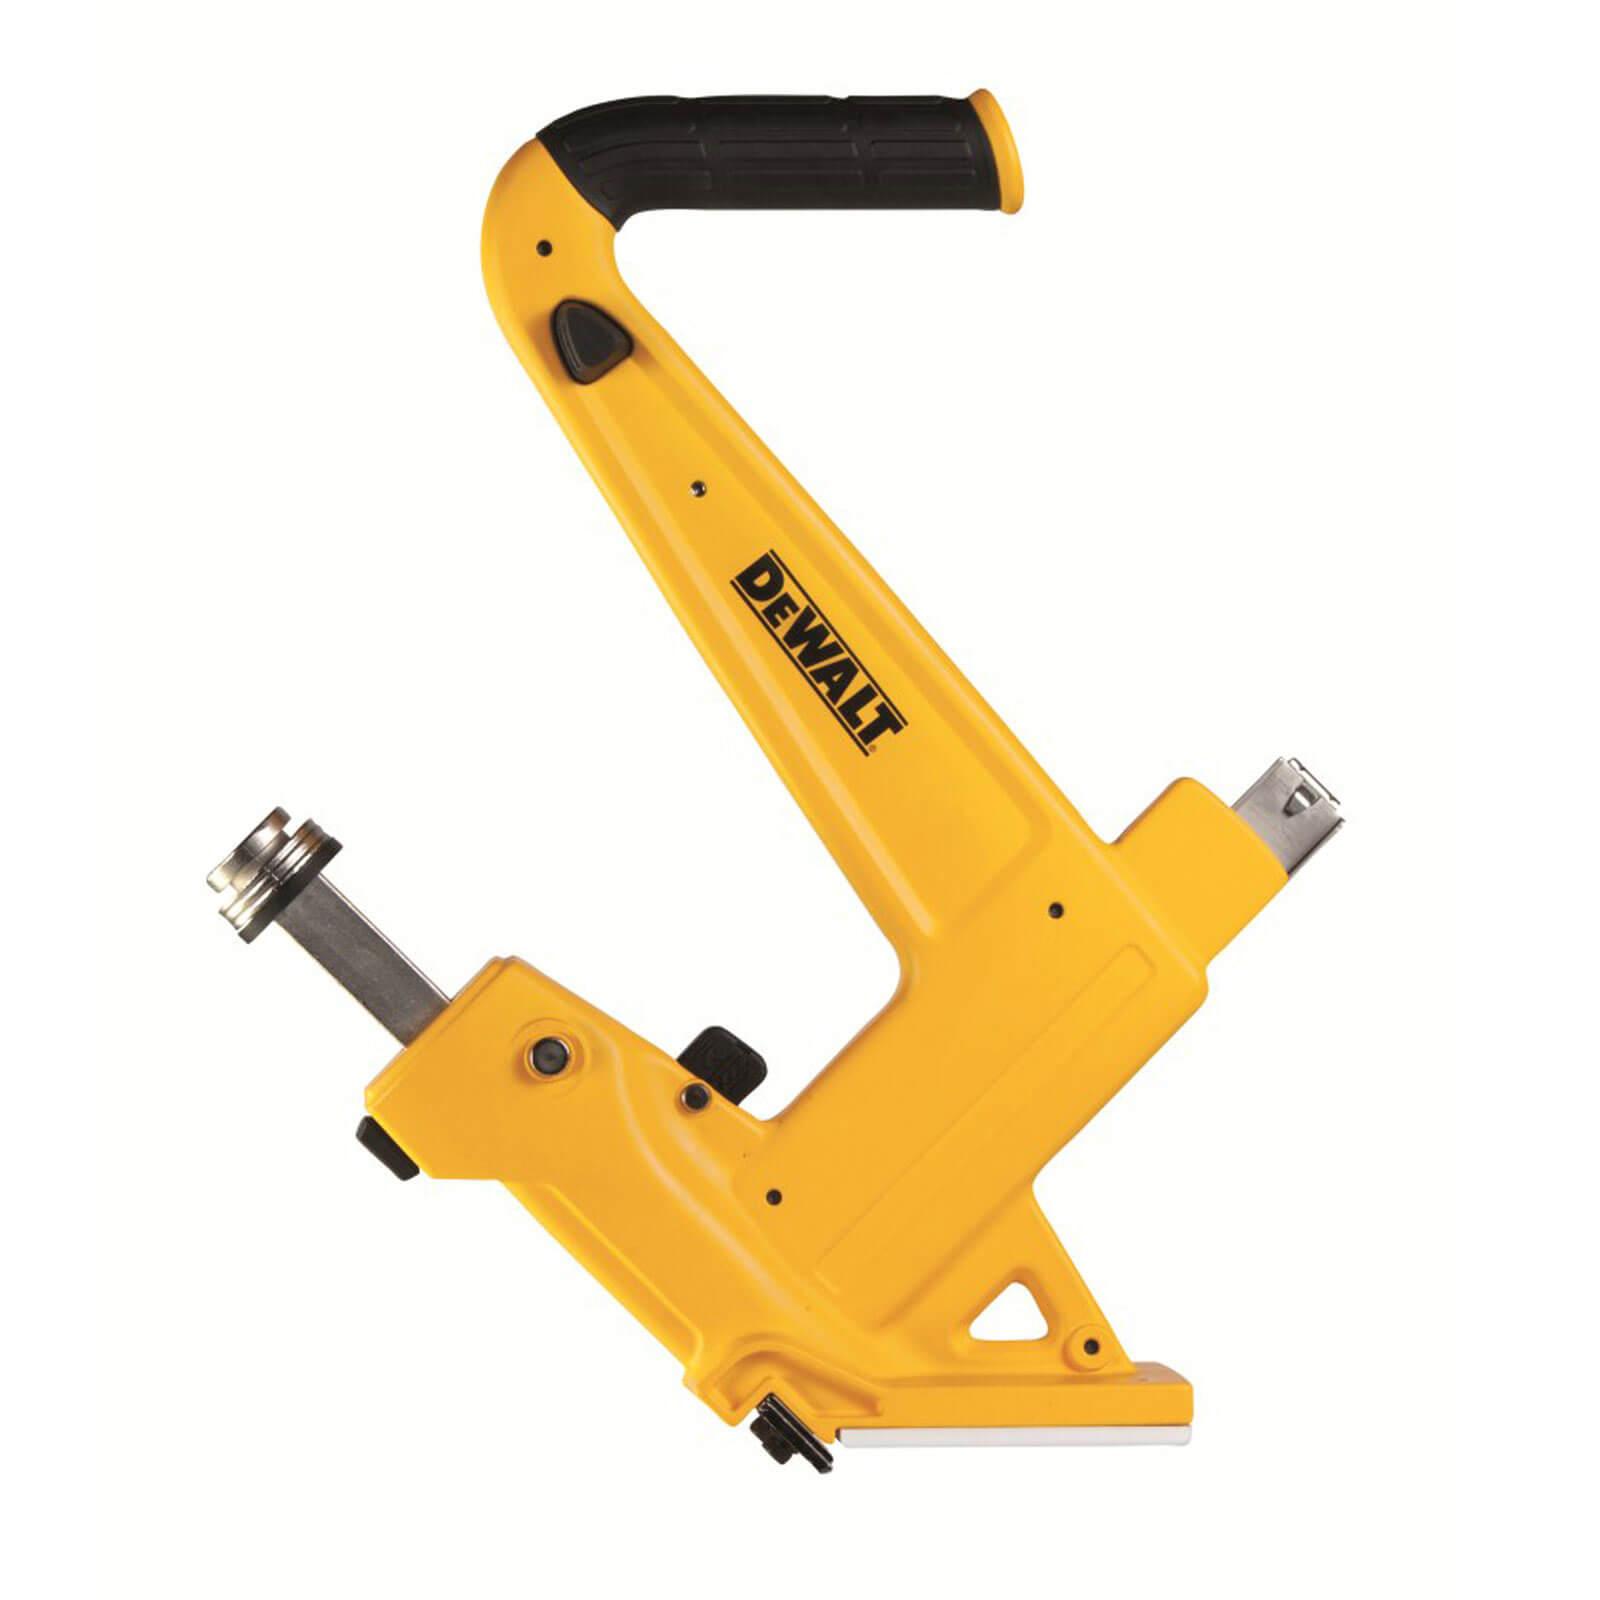 Image of DeWalt DMF1550 Manual Flooring Nailer